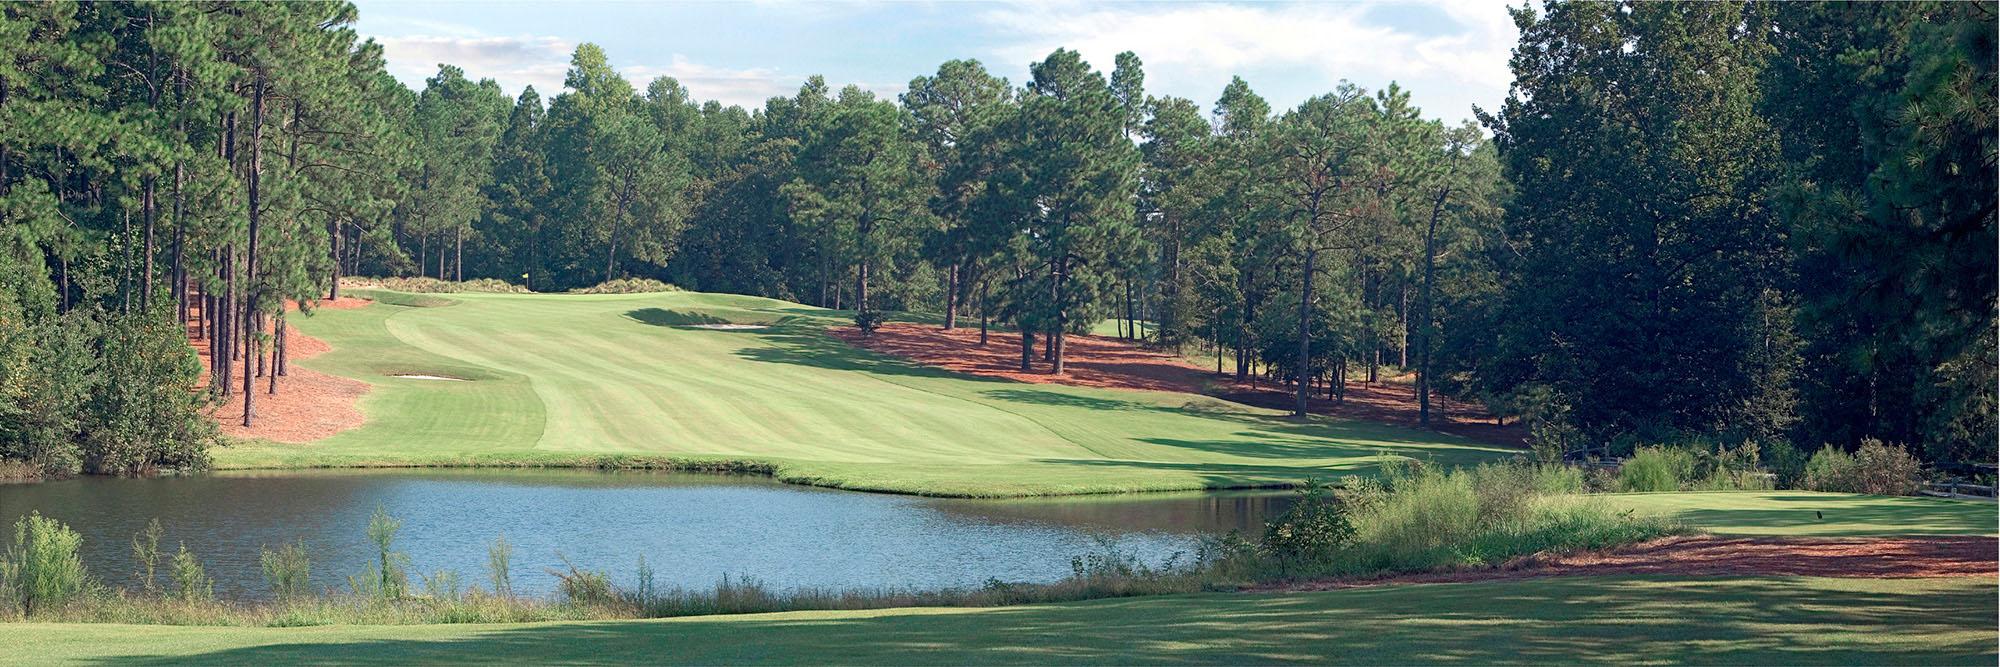 Golf Course Image - Pine Needles No. 4